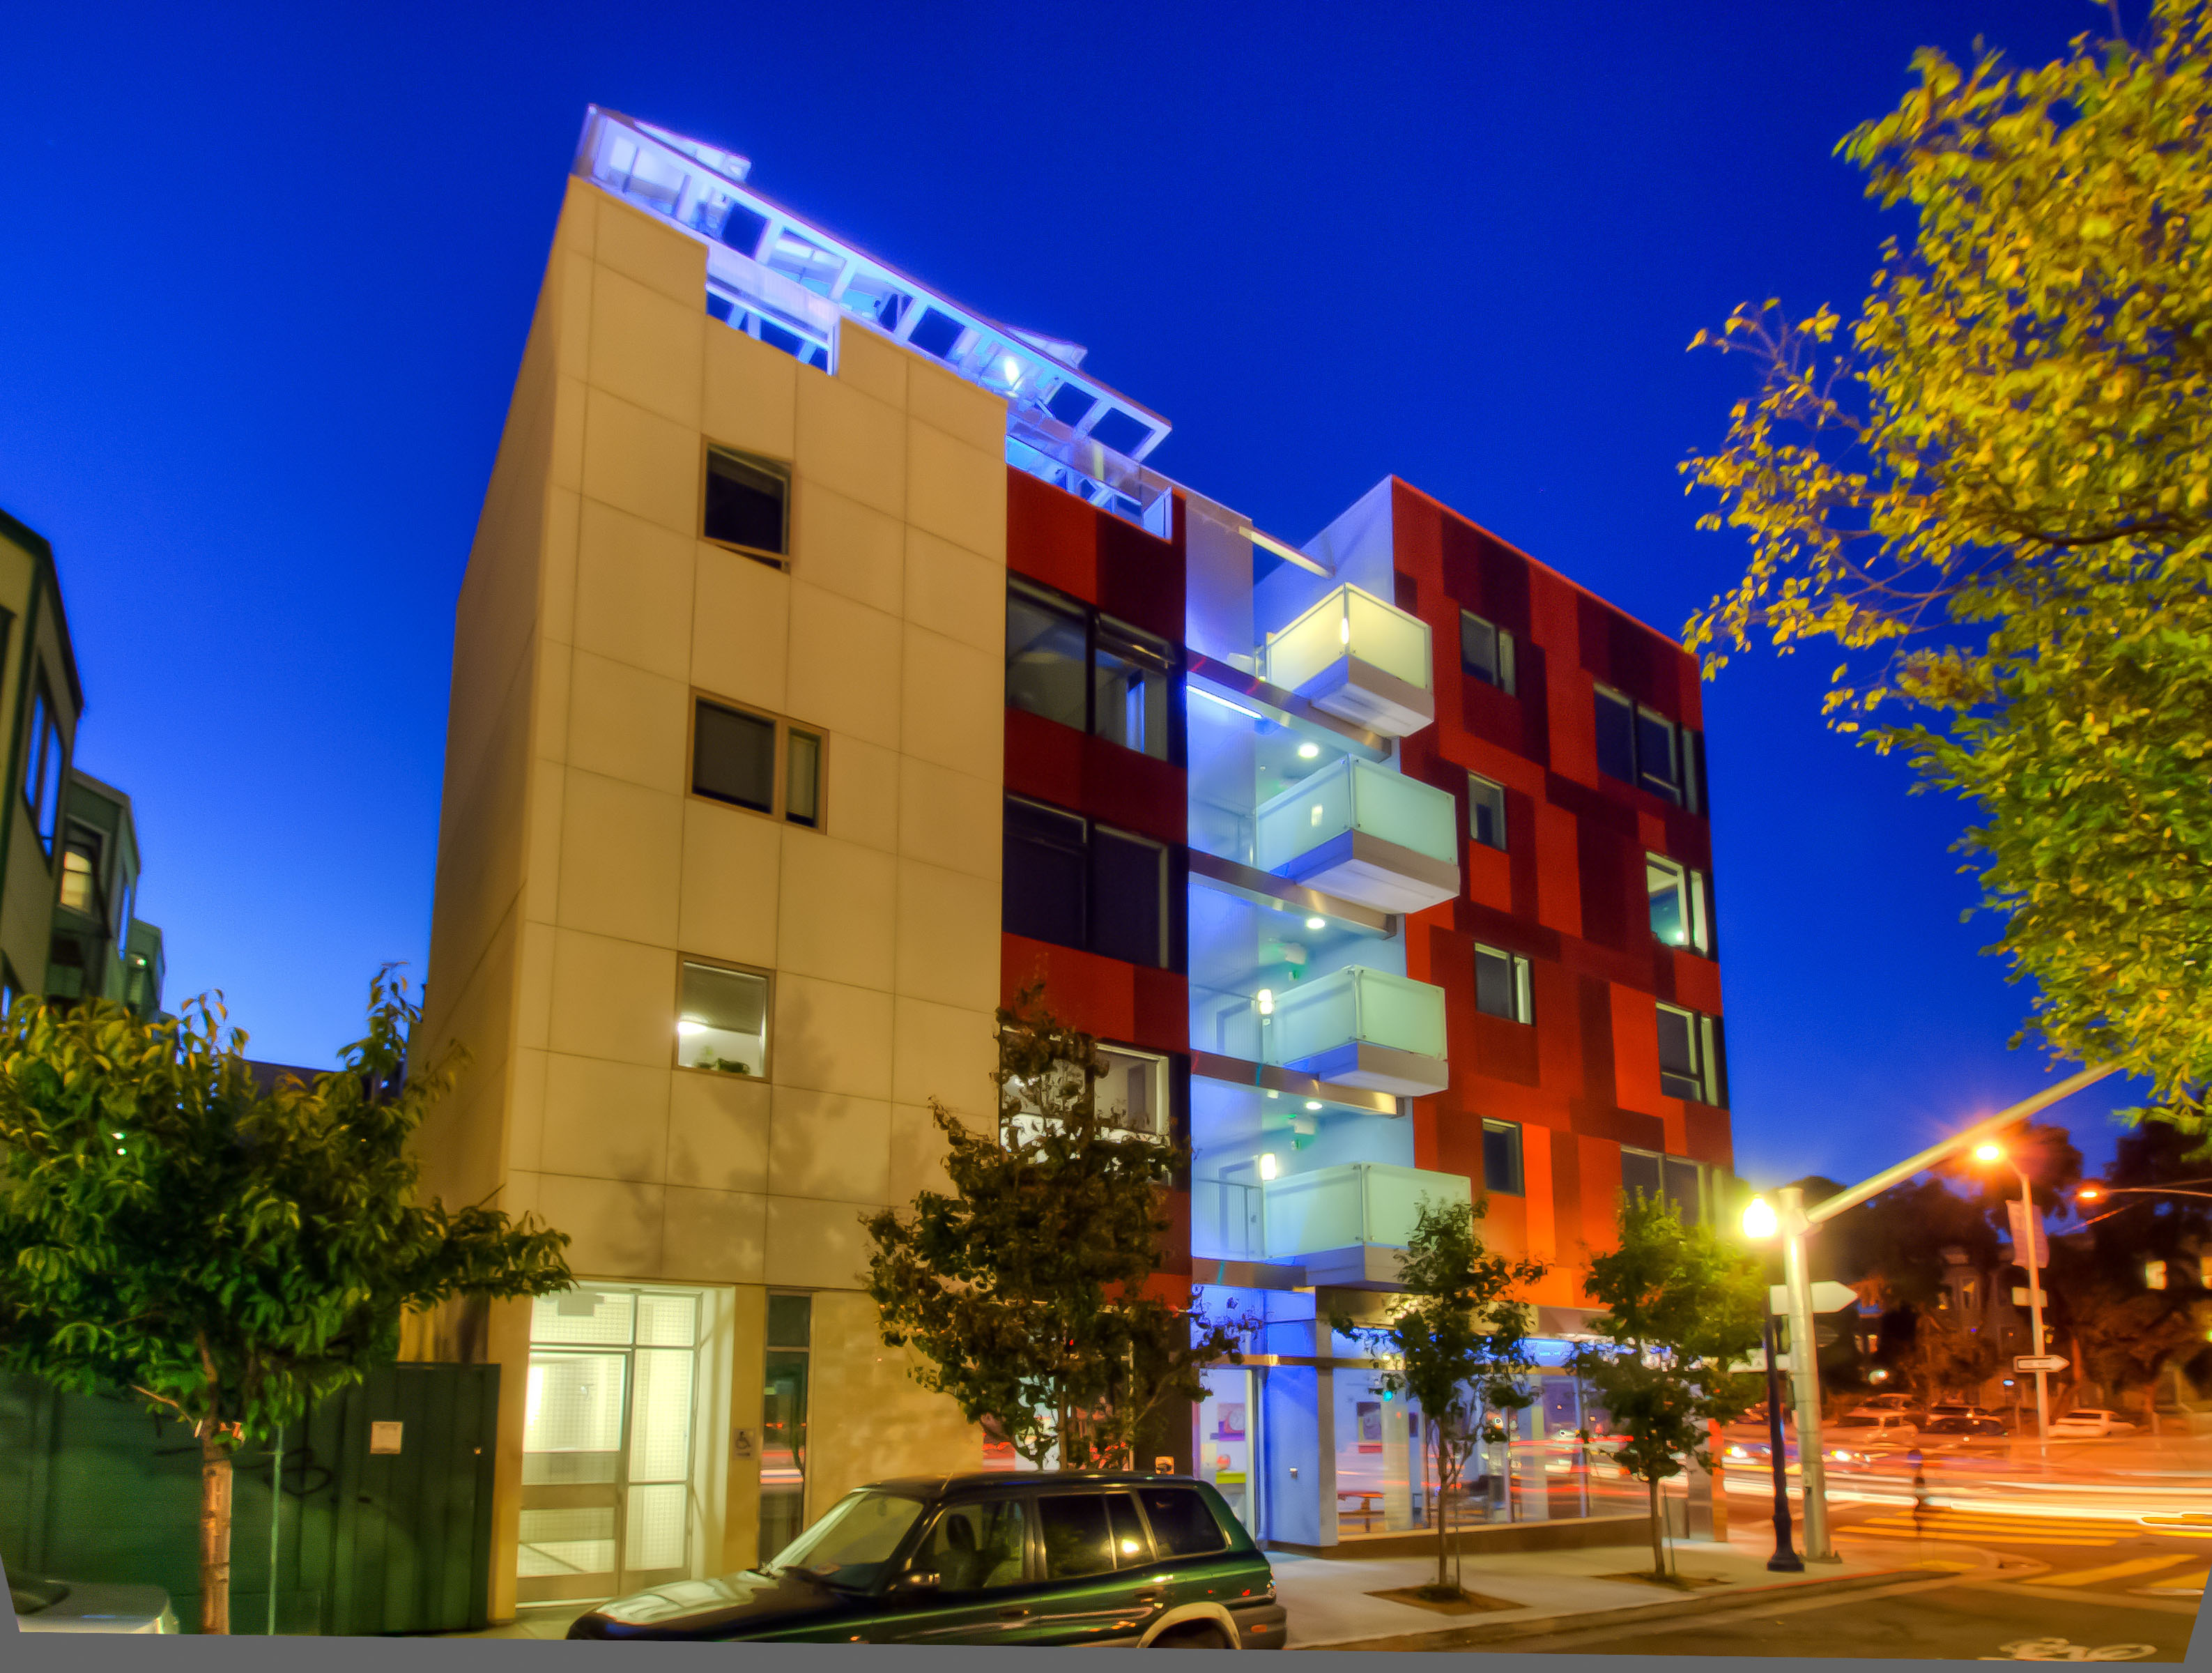 John King Reviews Octavia Court Apartments For The San Francisco Chronicle